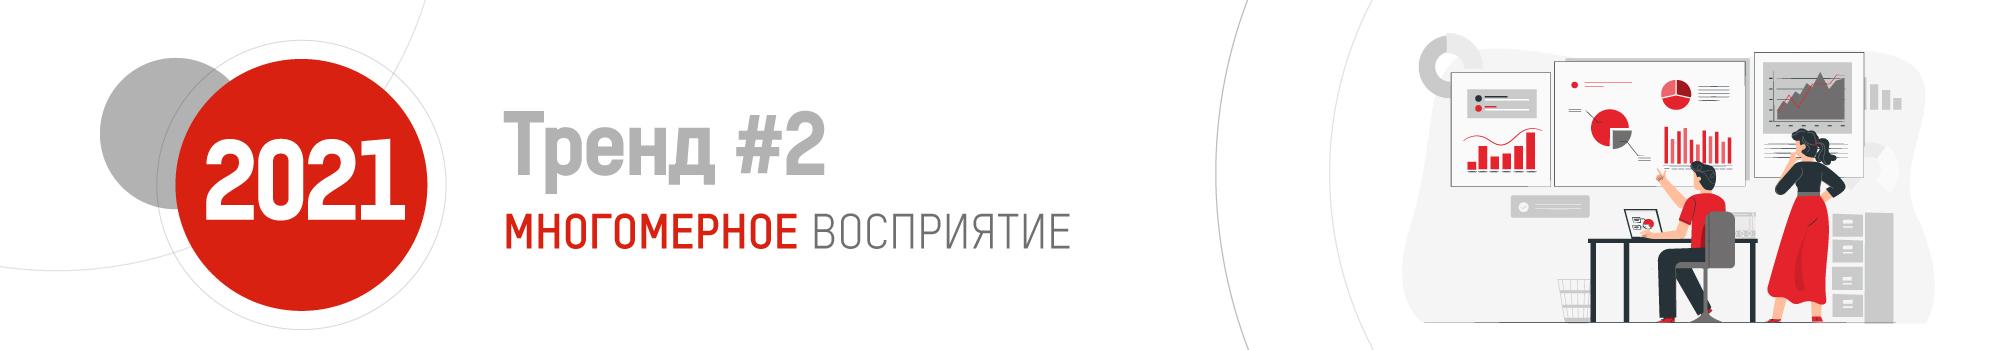 -----2021---2